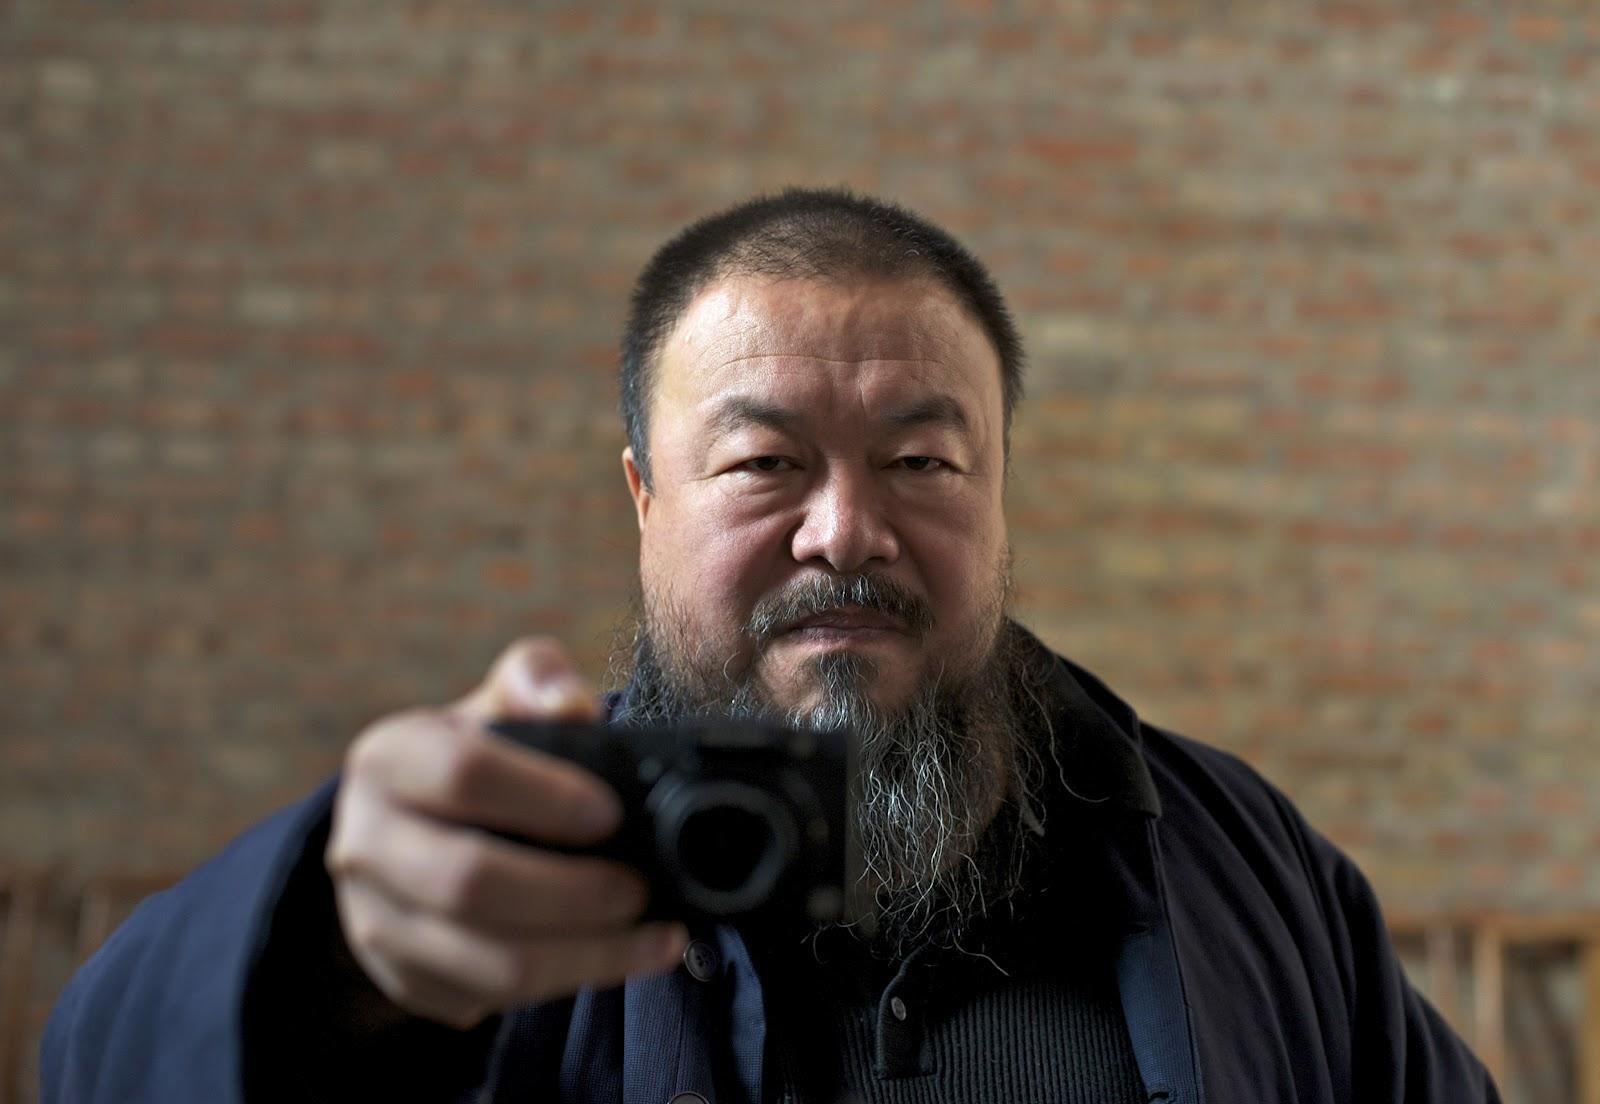 The Ai Weiwei documentary <i>Never Sorry</i> screens on Thursday 7/6